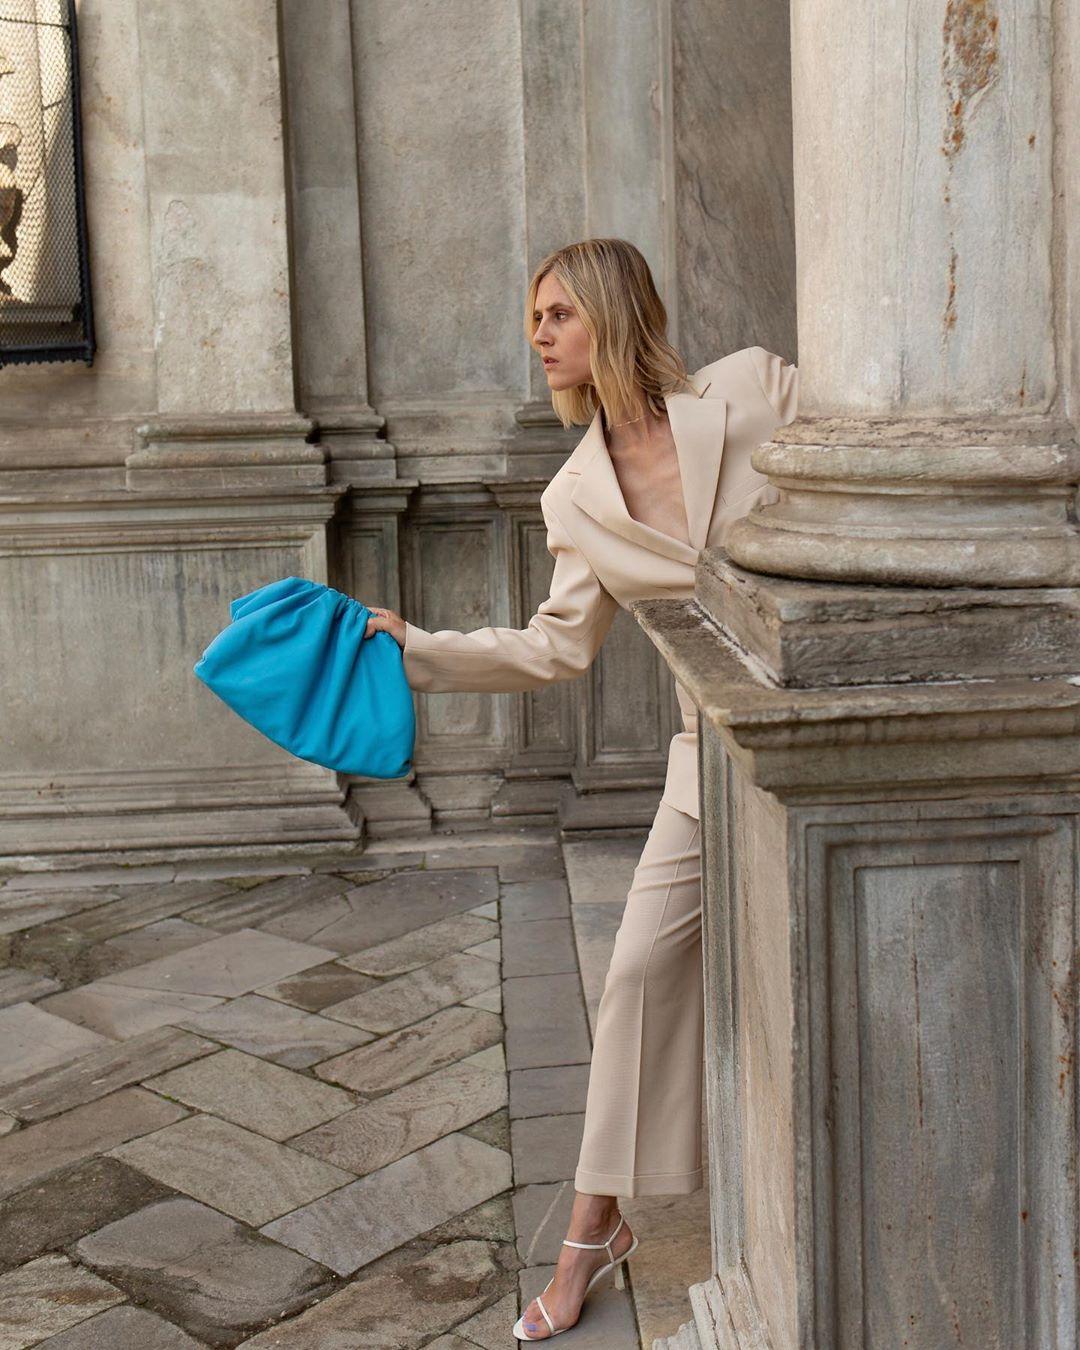 bottega-veneta-the-pouch-sky-blue-linda-tol-street-style